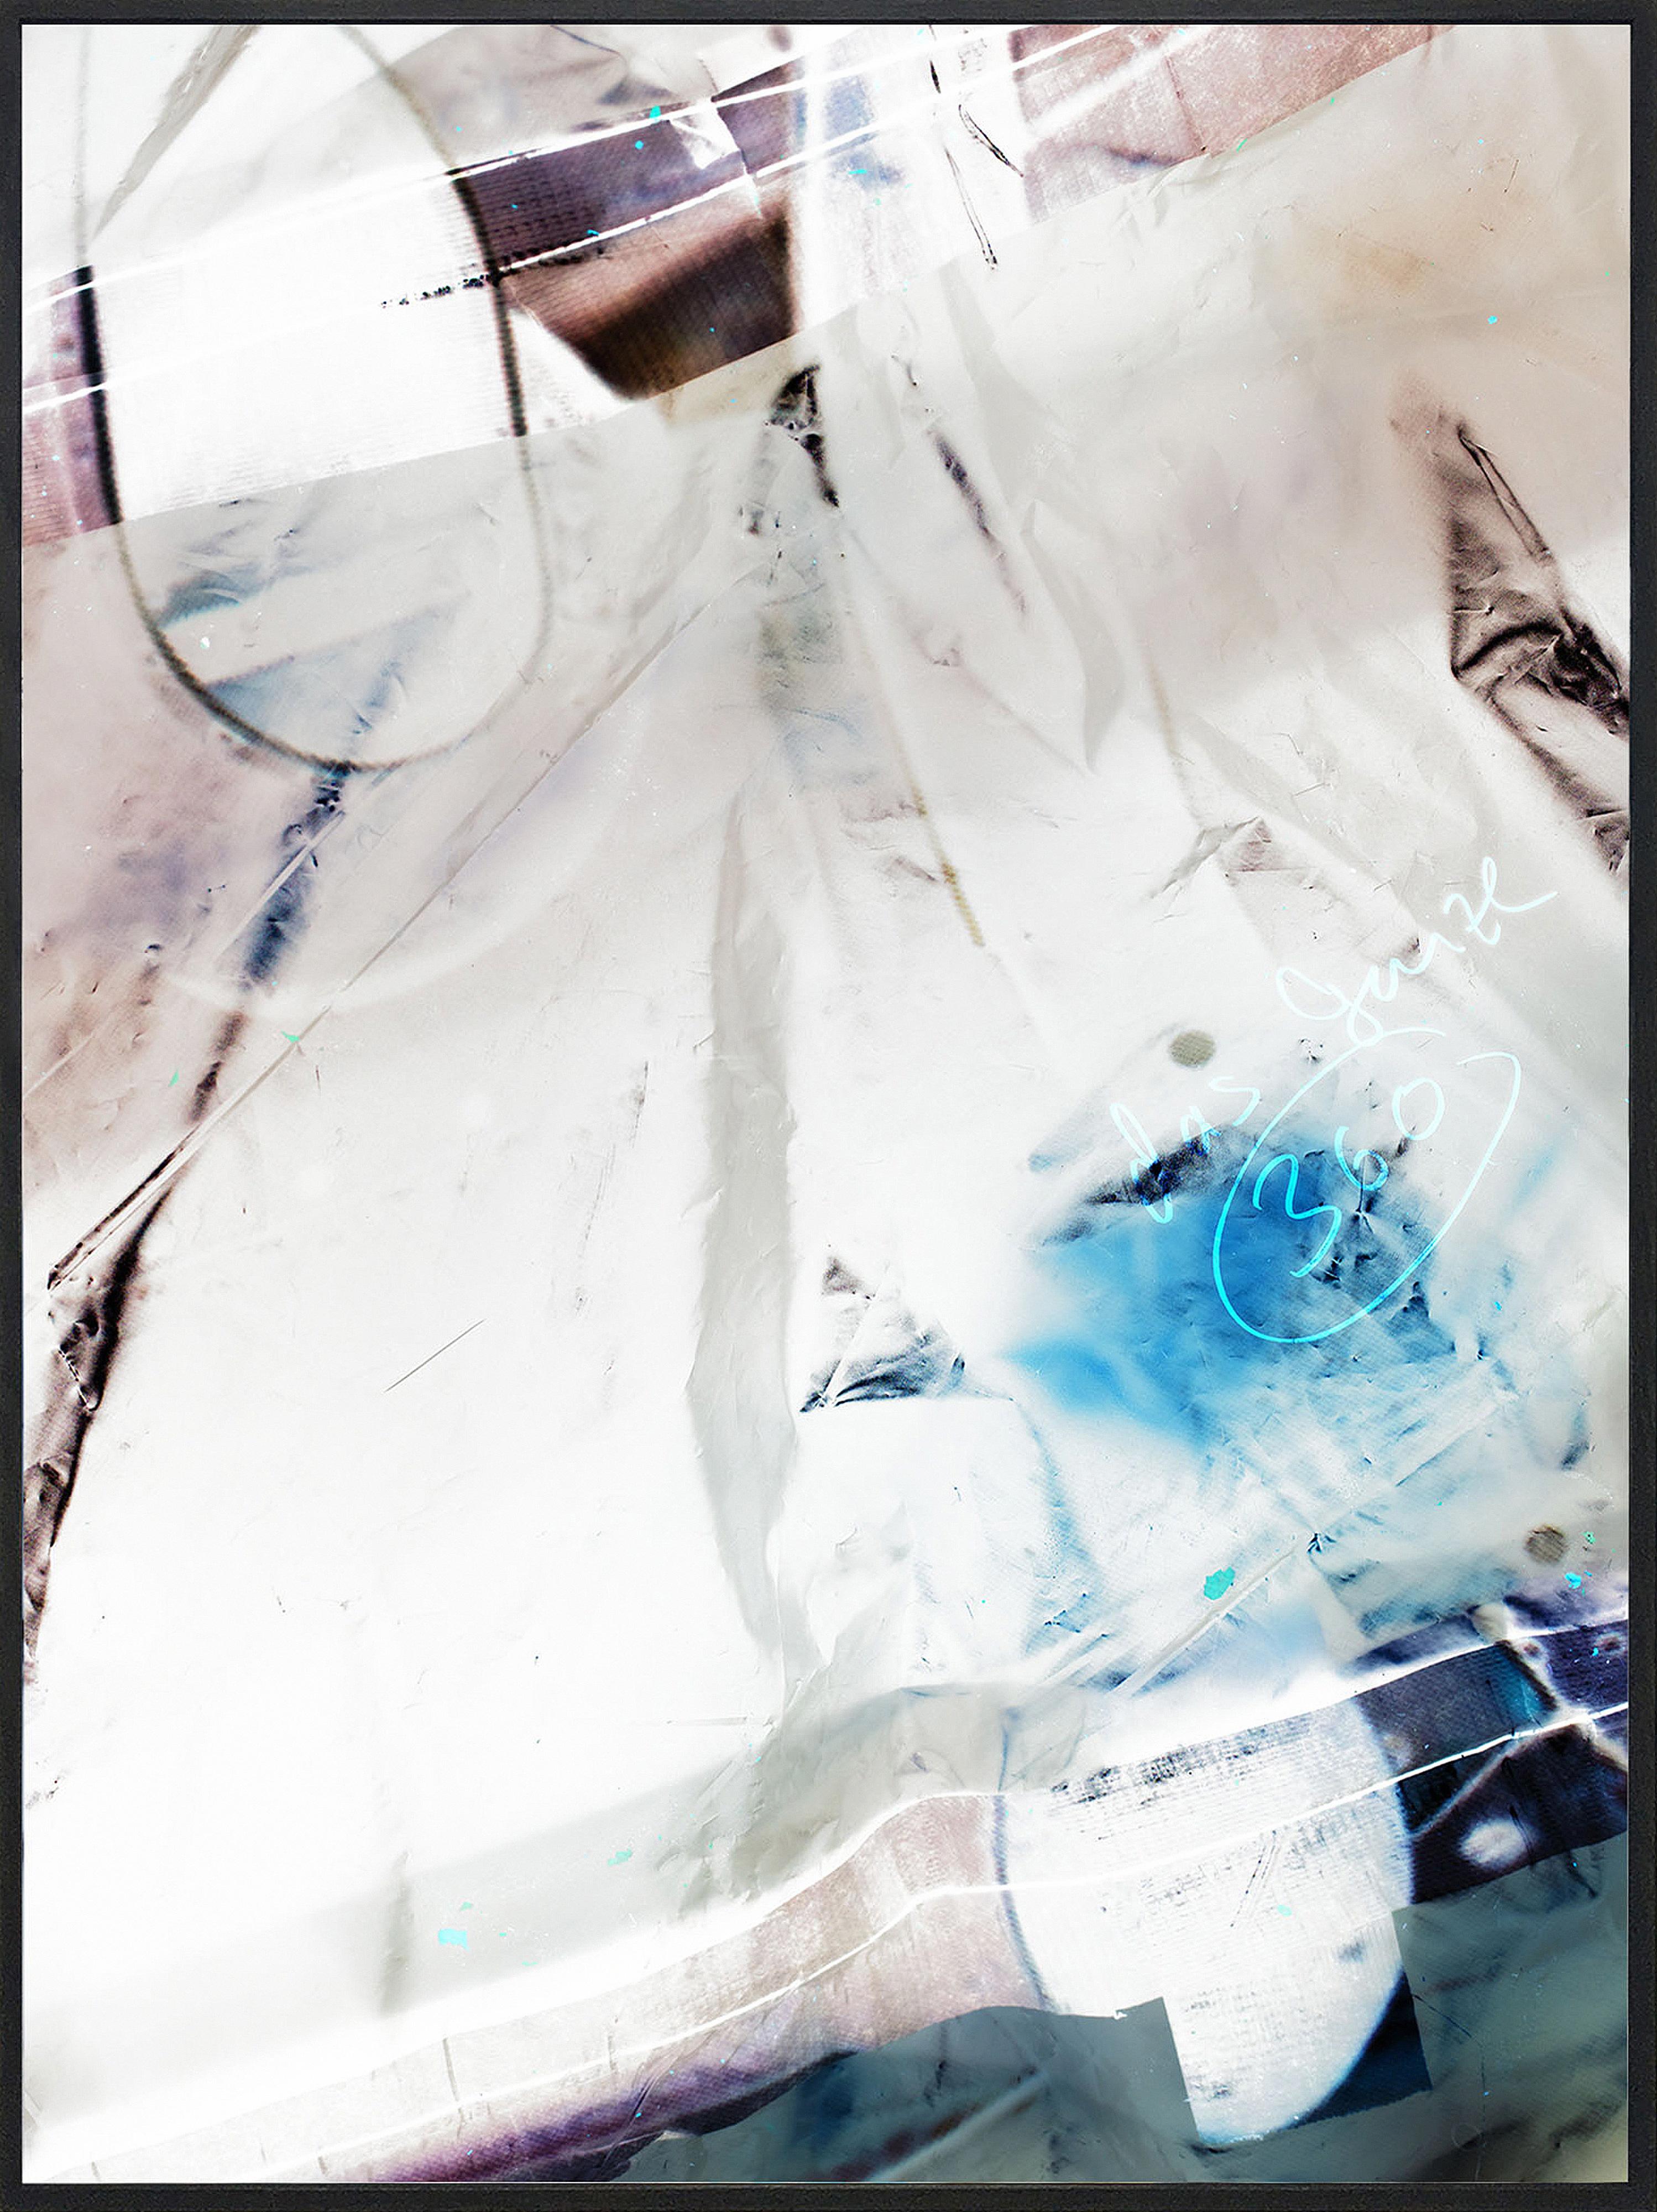 Galerie Barbara Thumm \ New Viewings #29 \ New Viewings #29